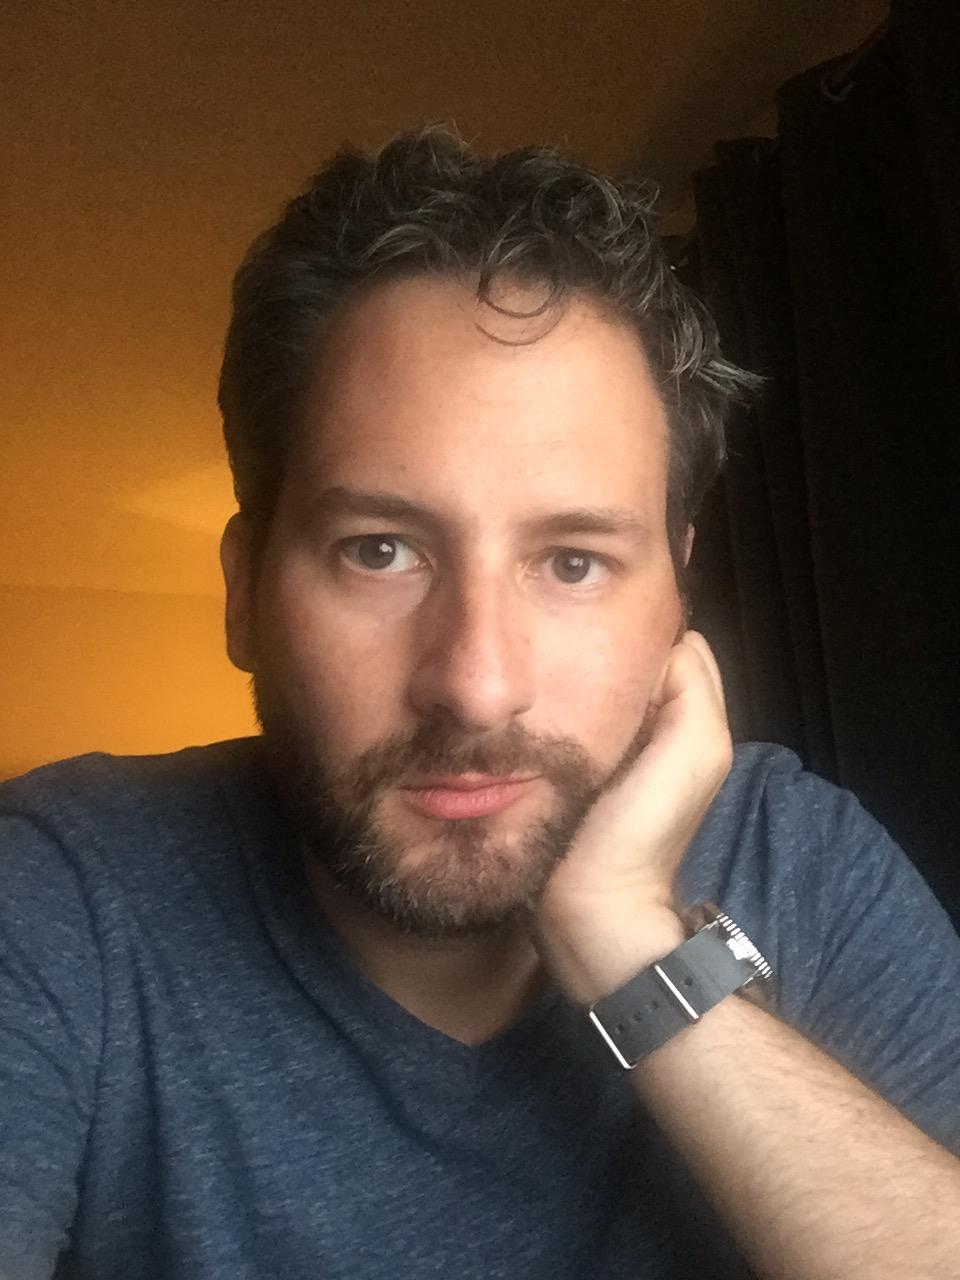 Josh Silfen | Director of Photography